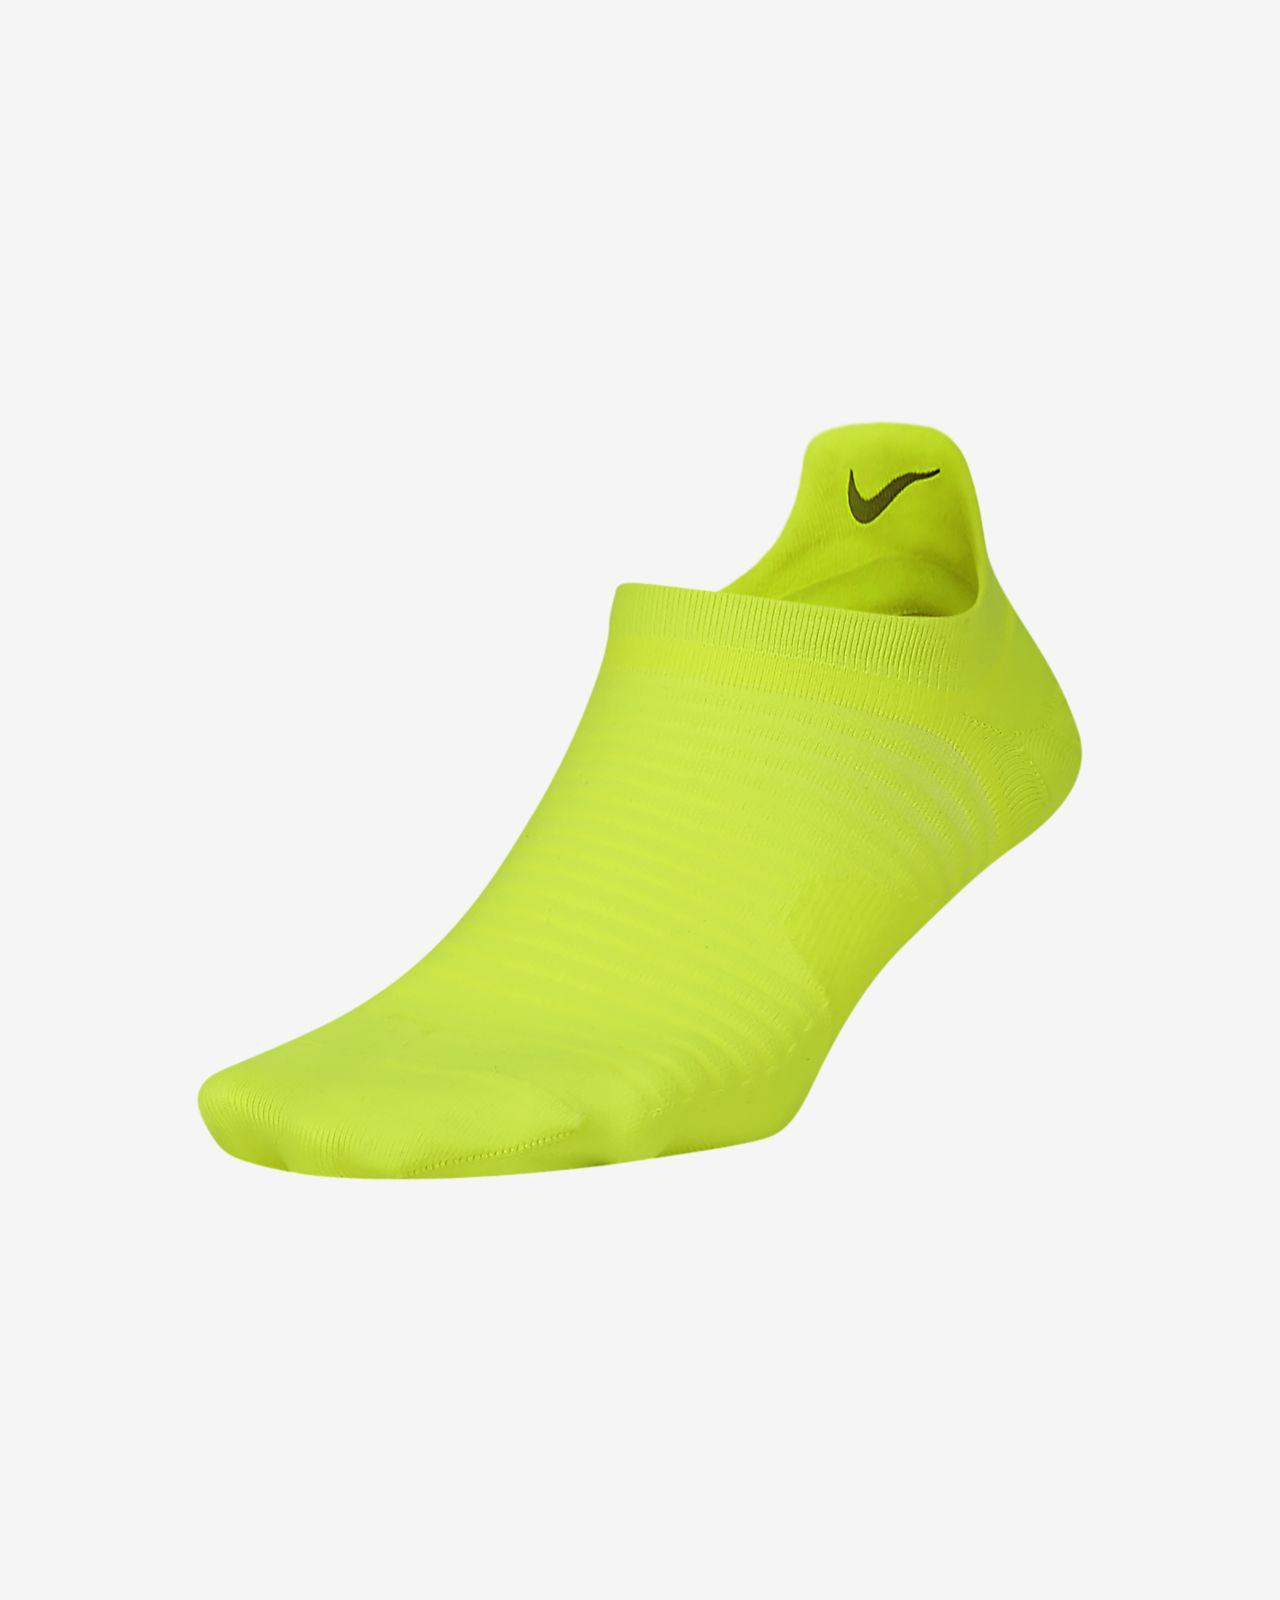 pena Calibro tozzo  Nike Spark Lightweight No-Show Running Socks. Nike ZA